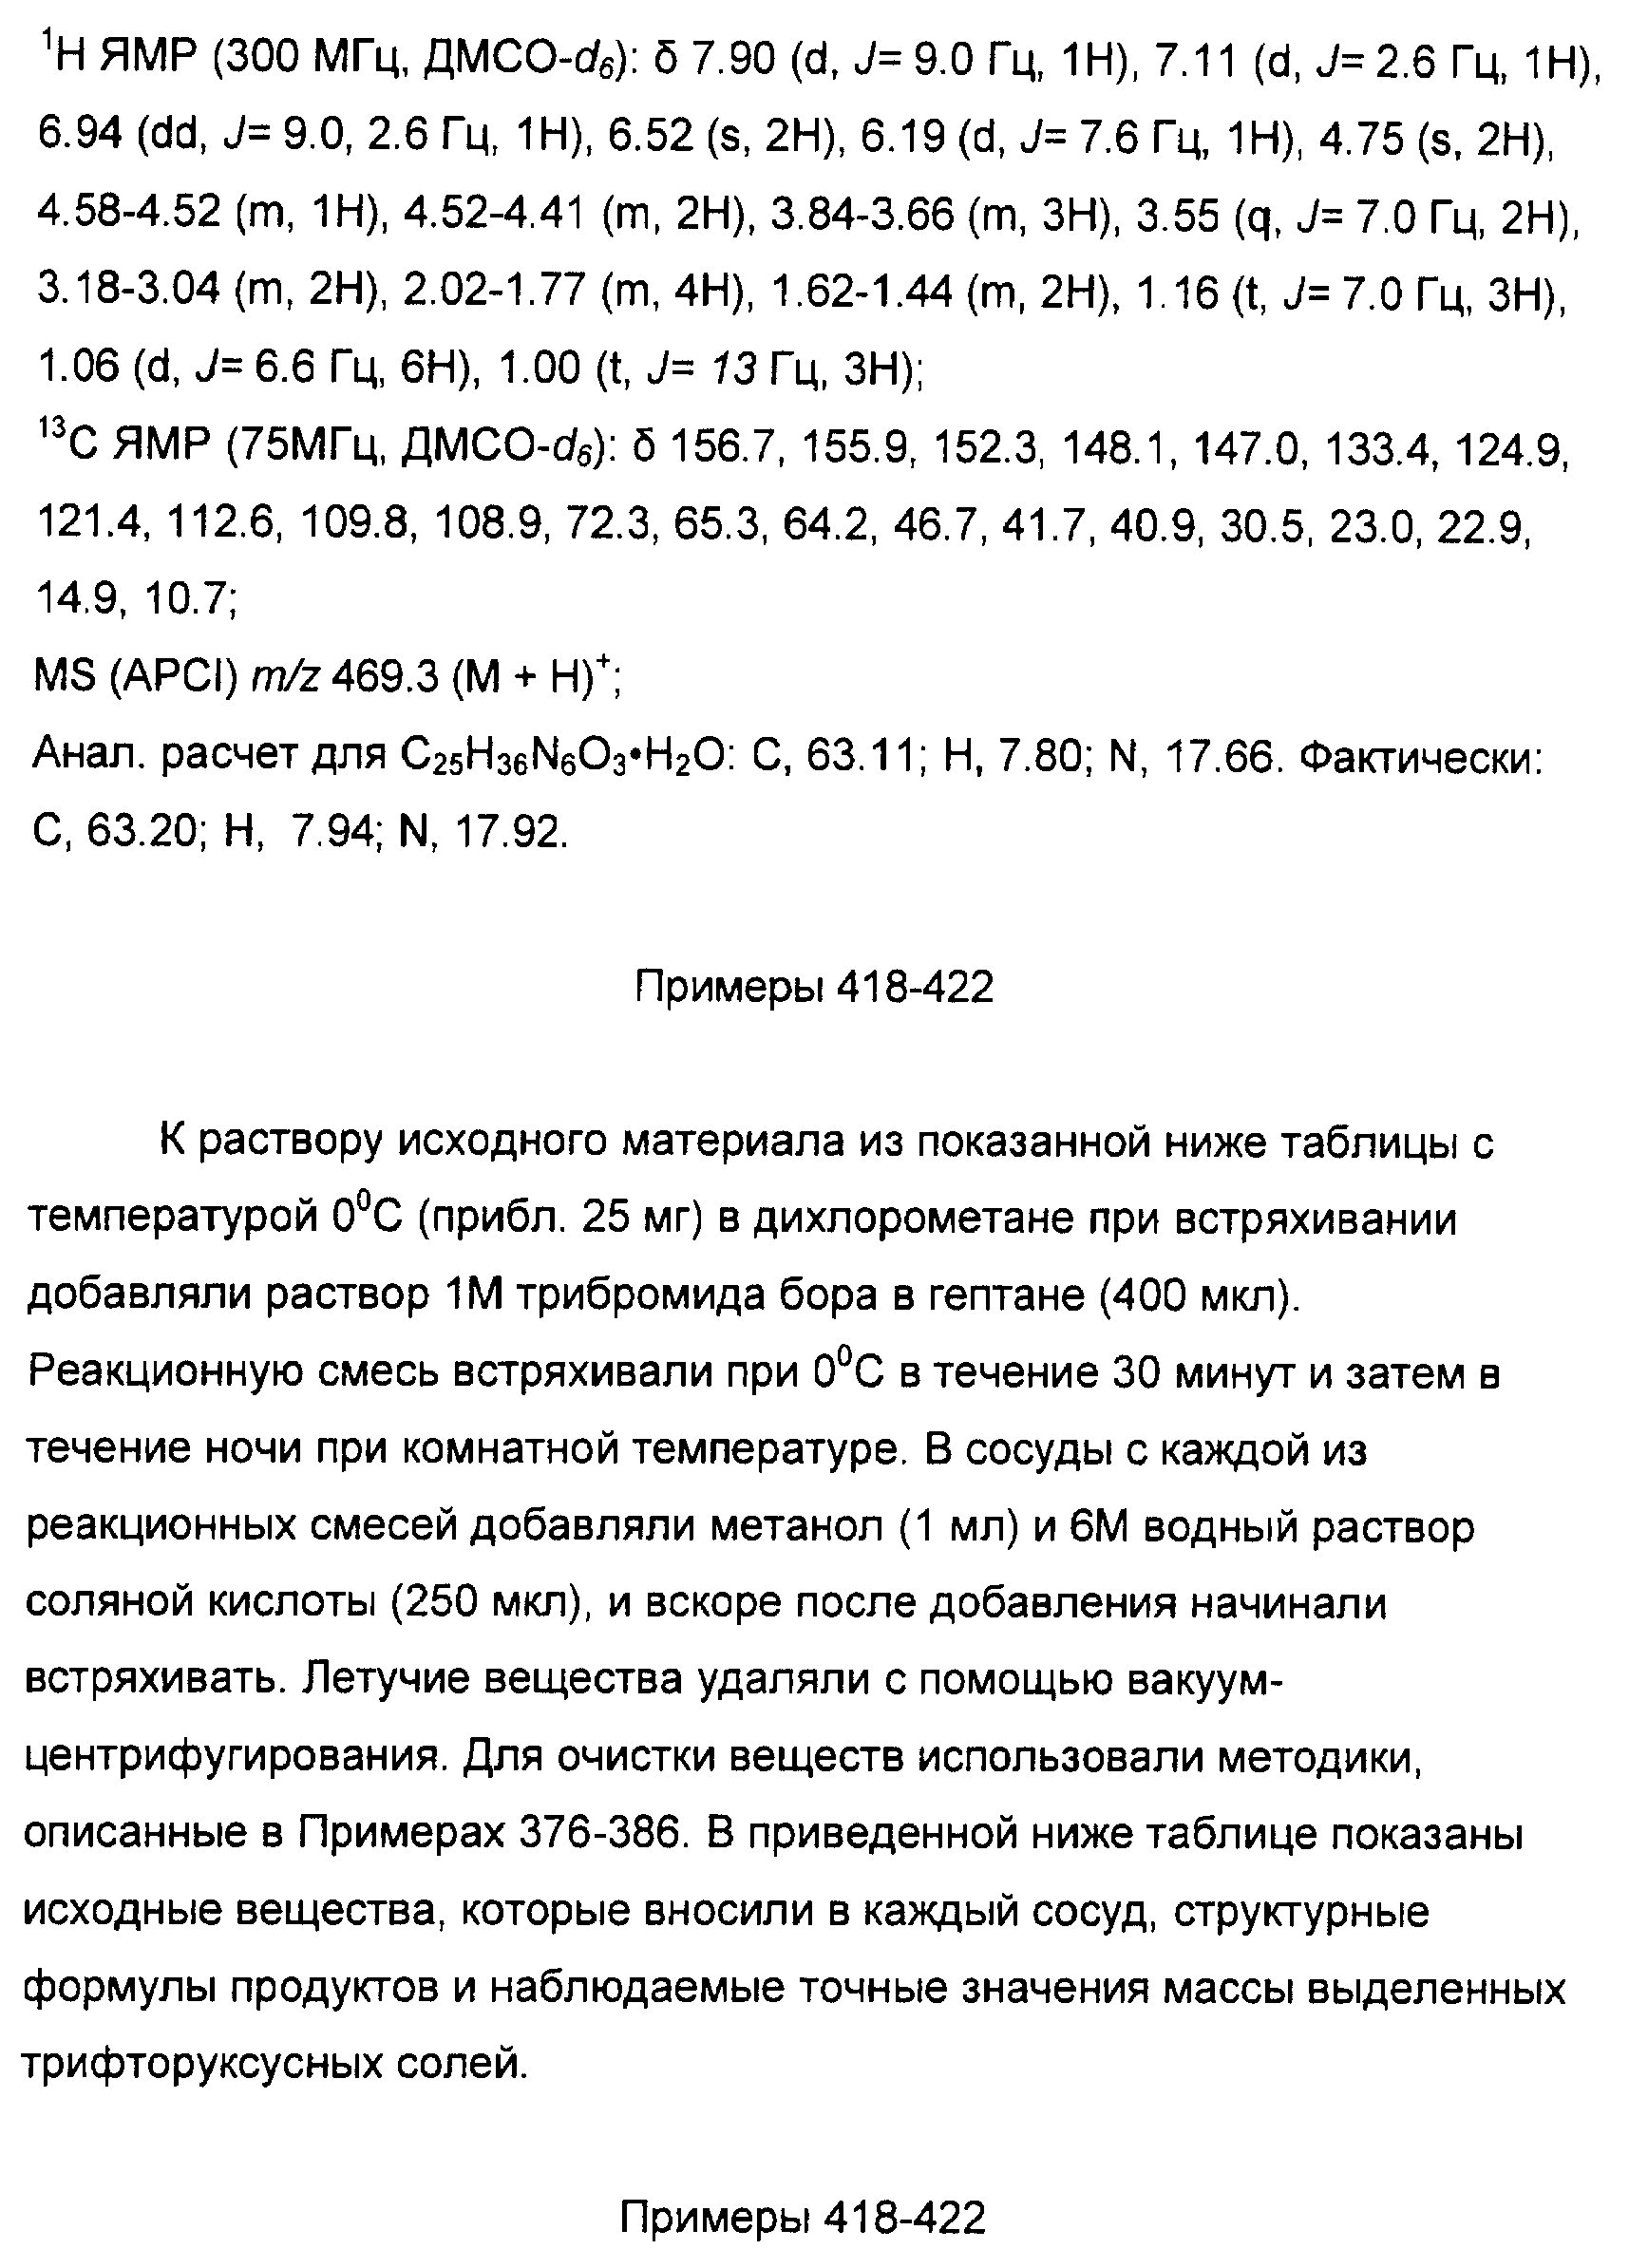 Figure 00000295